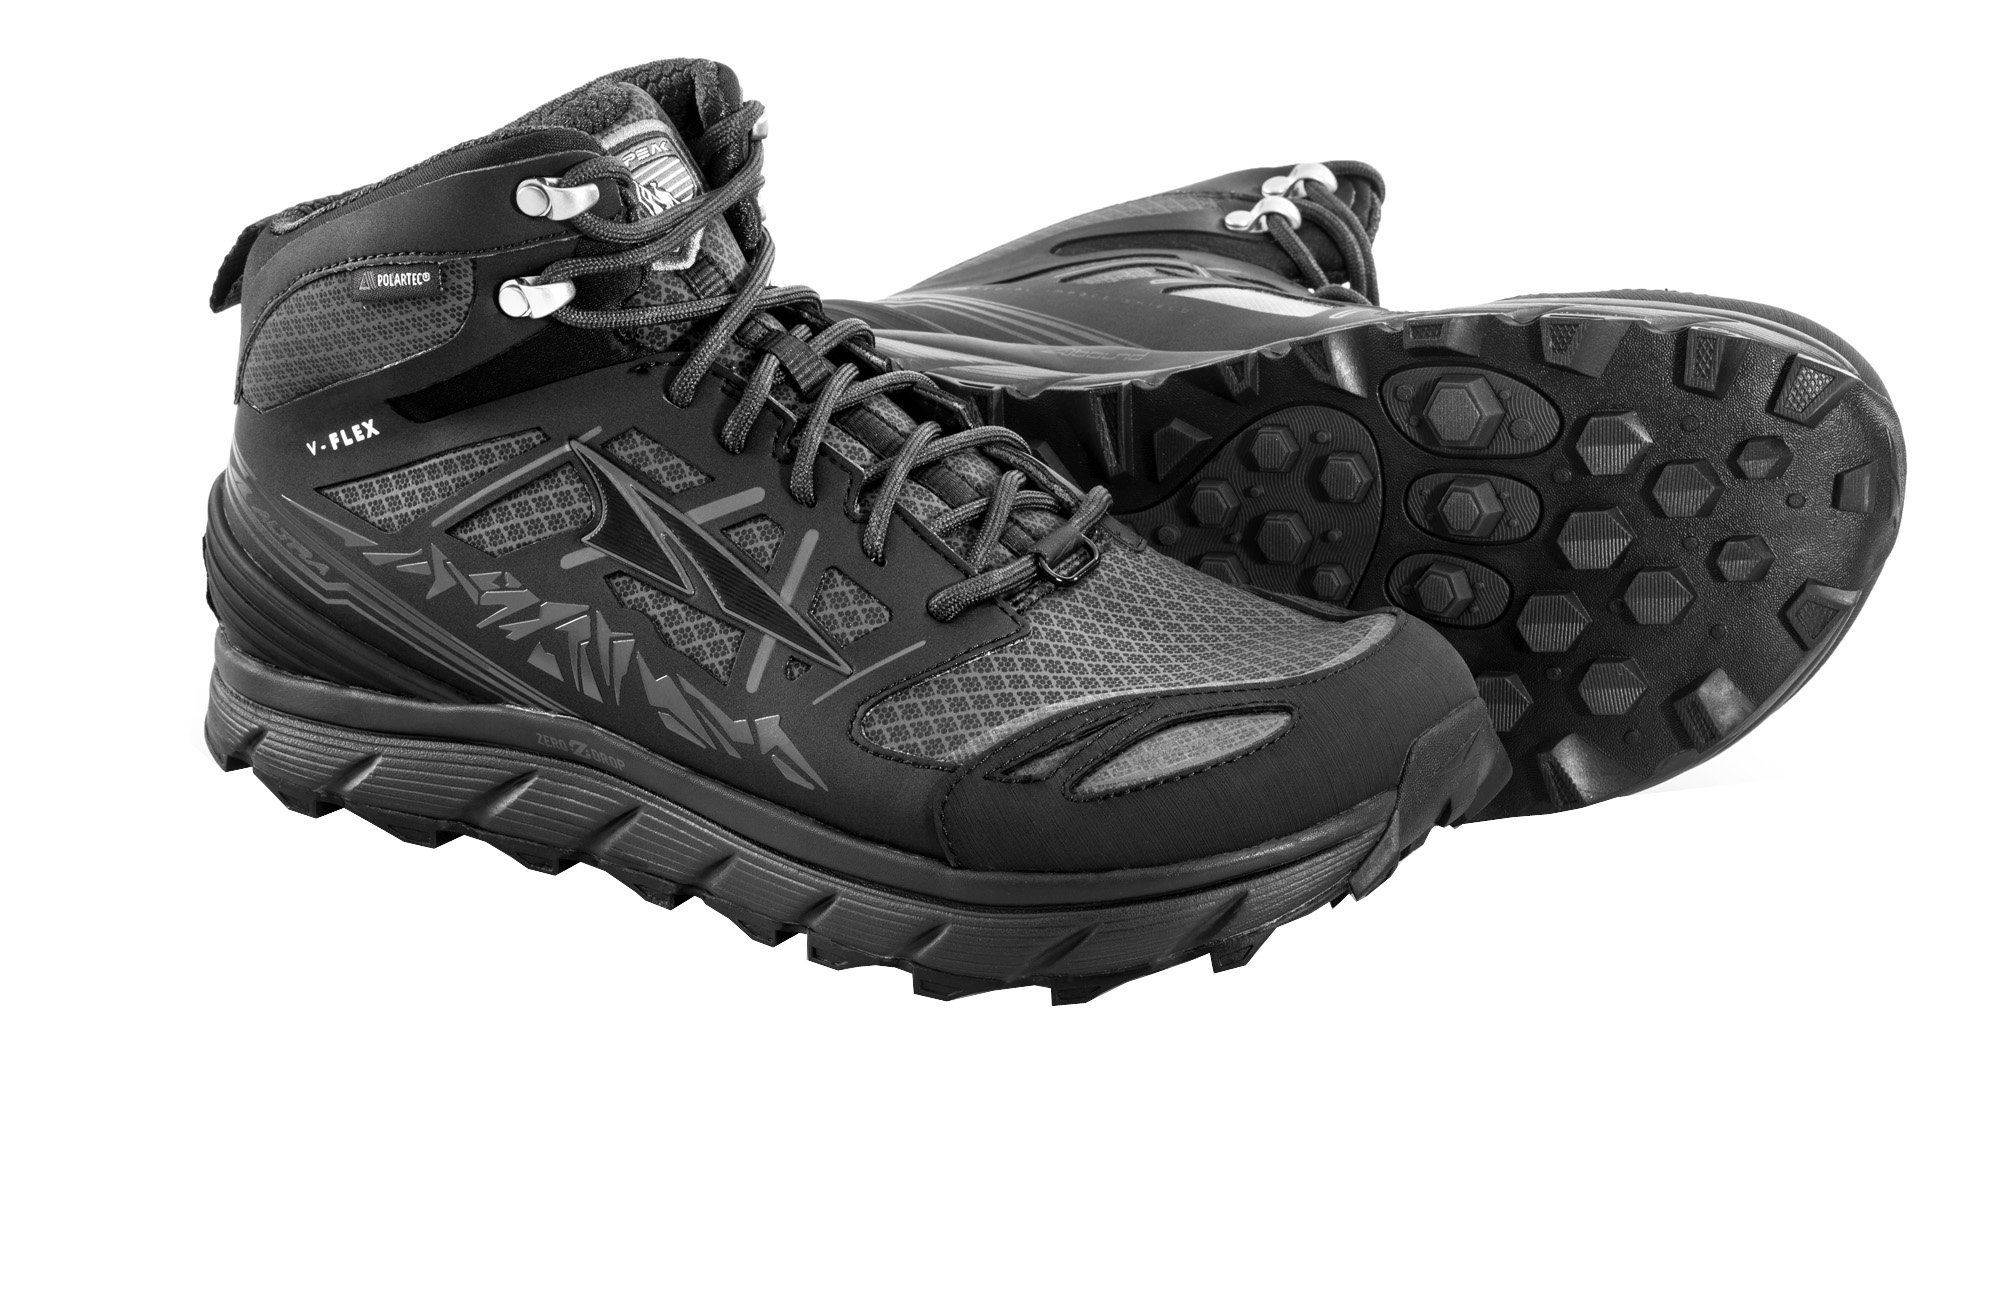 Altra Lone Peak 3 Mid Neo Running Shoes - Men's Black 8.5